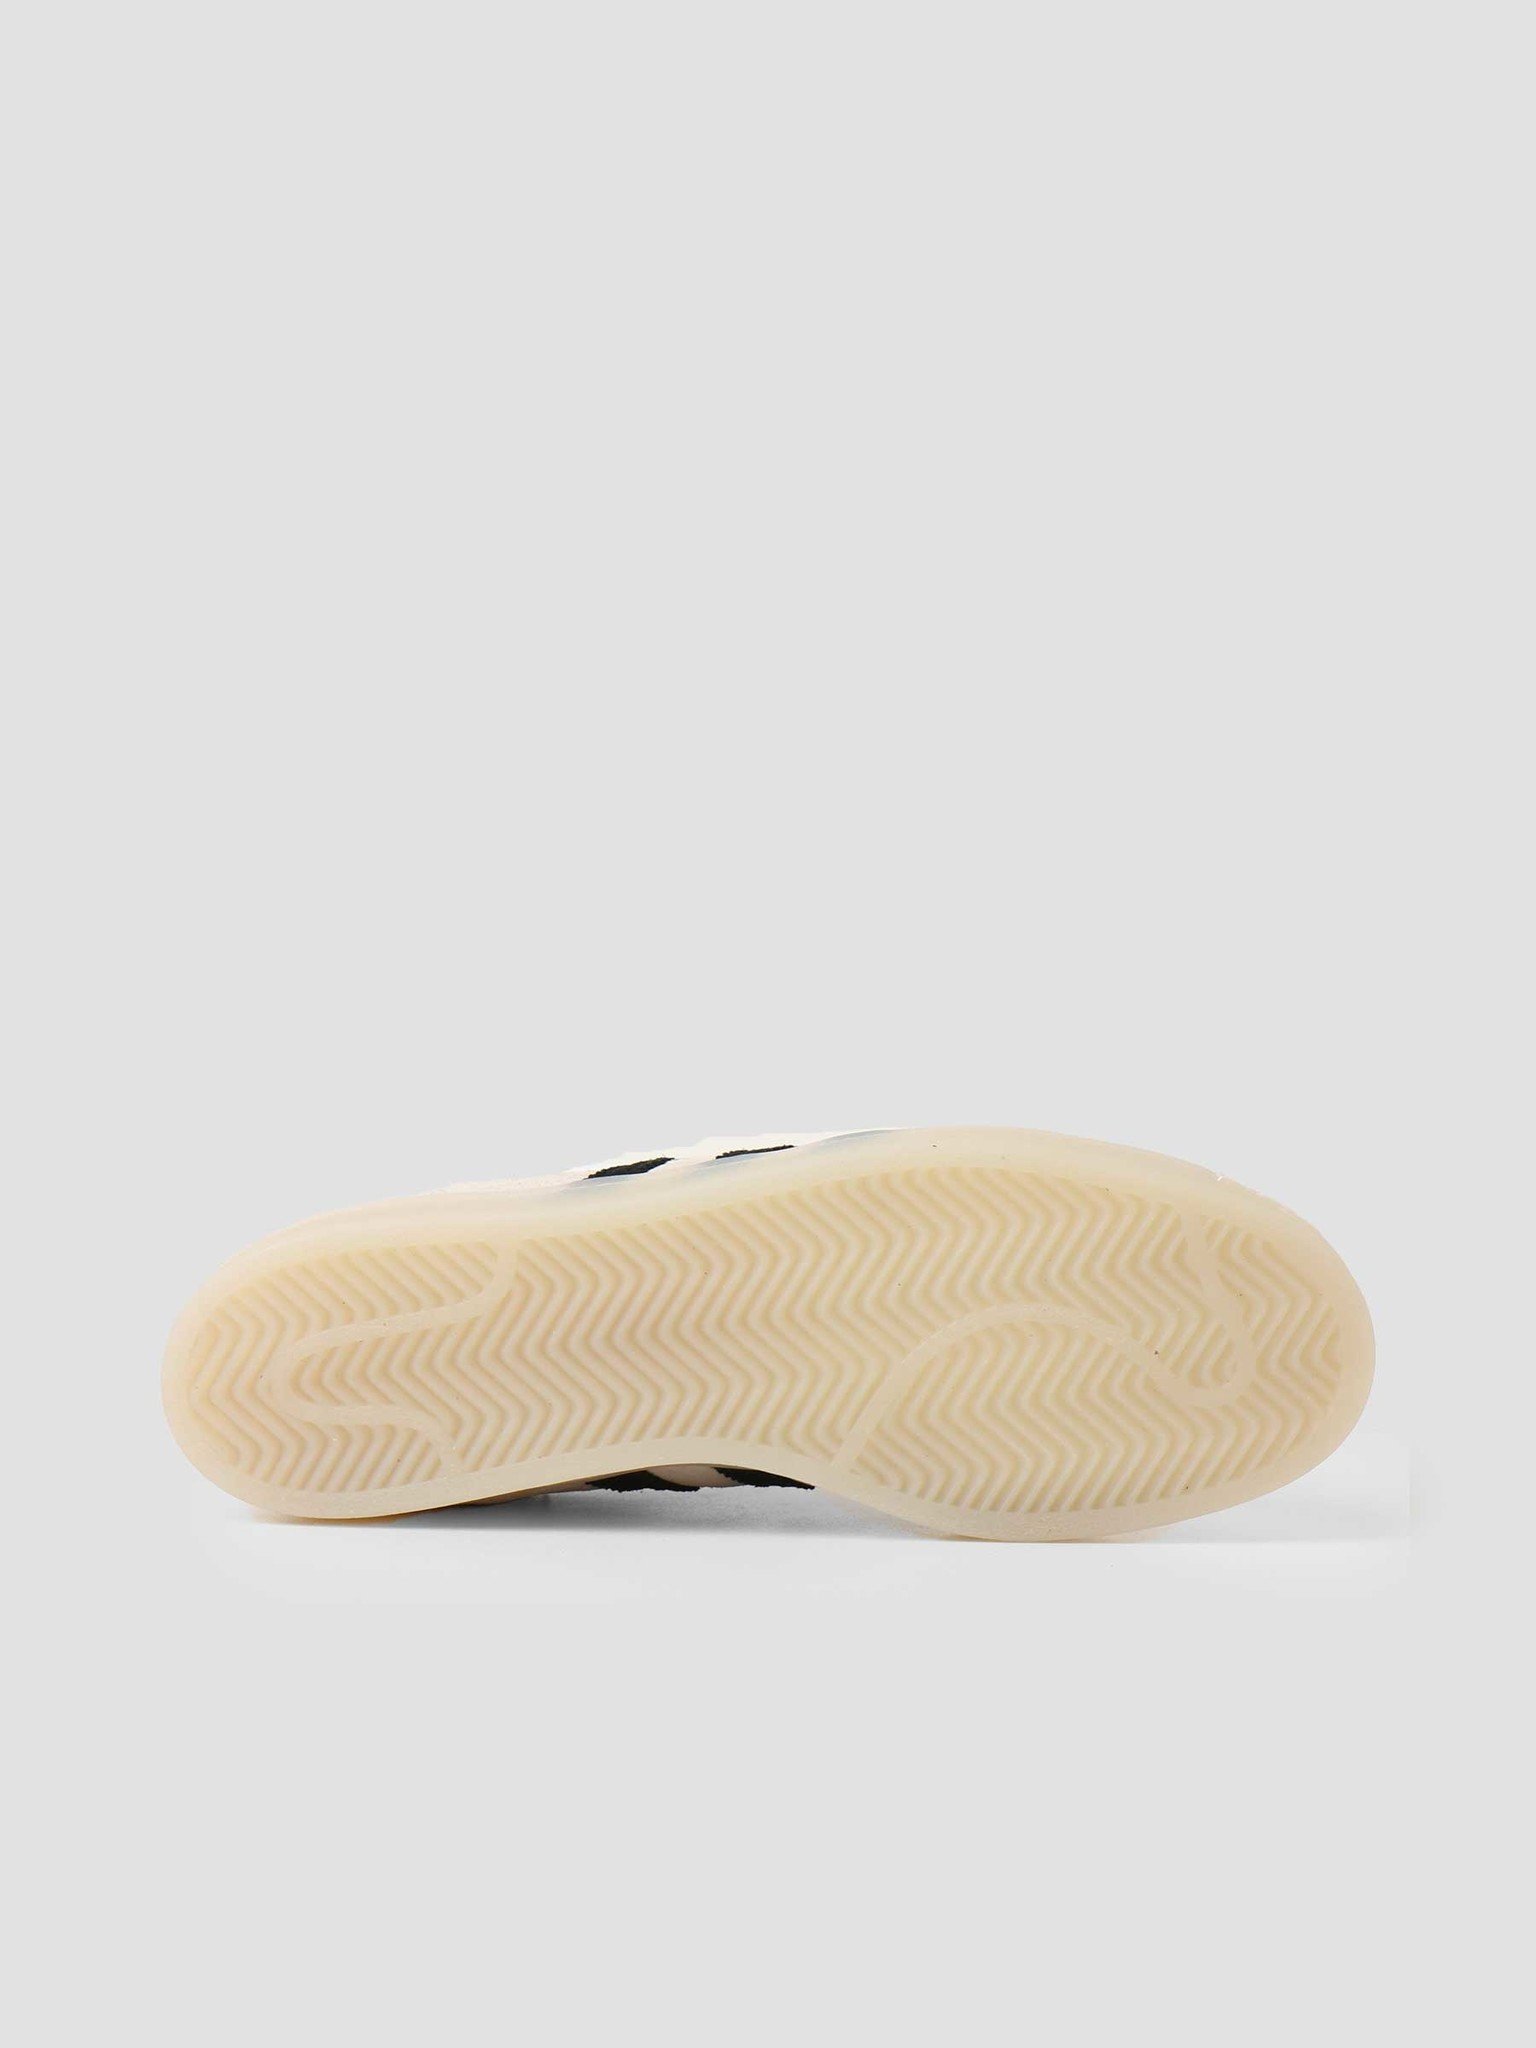 adidas adidas Superstar Ftwr White Core Black FX5565